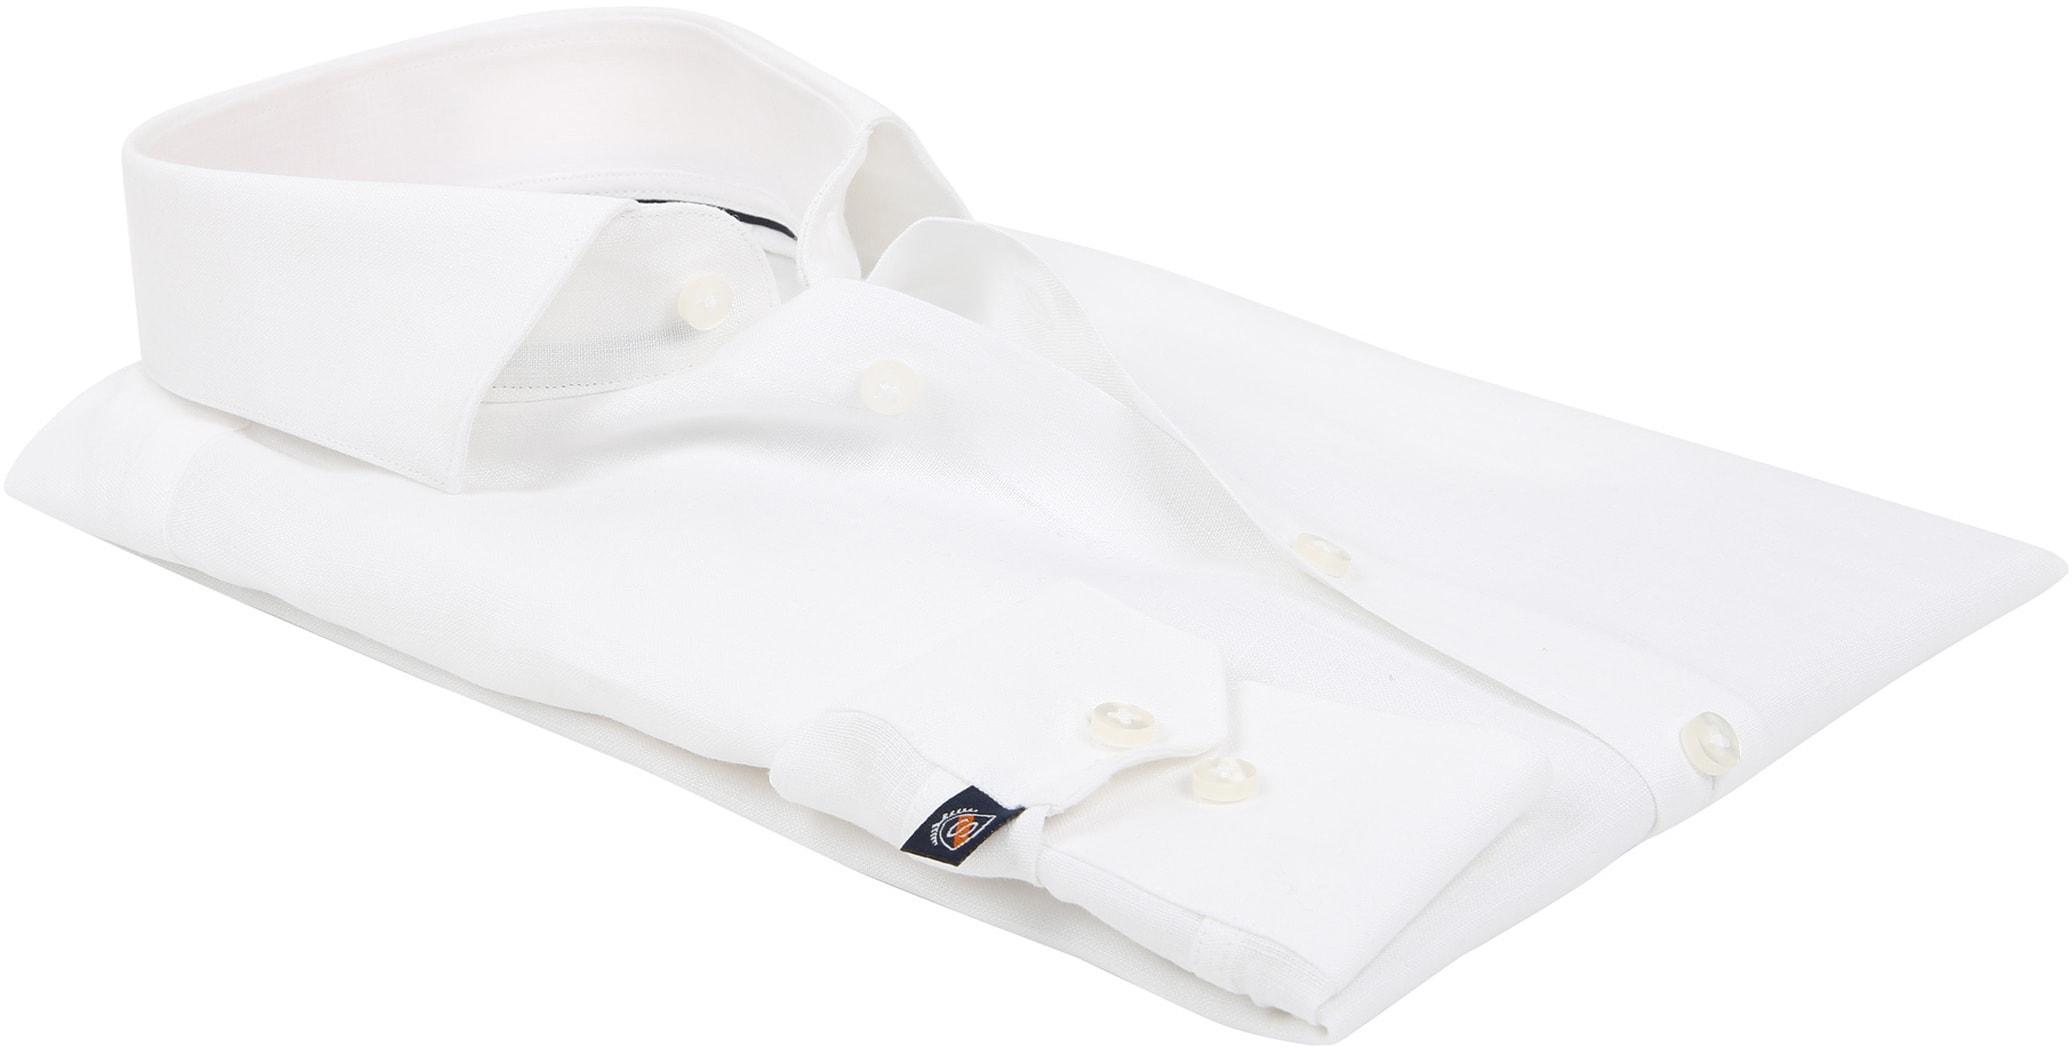 Suitable Hemd Leinen Weiß D81-13 foto 3